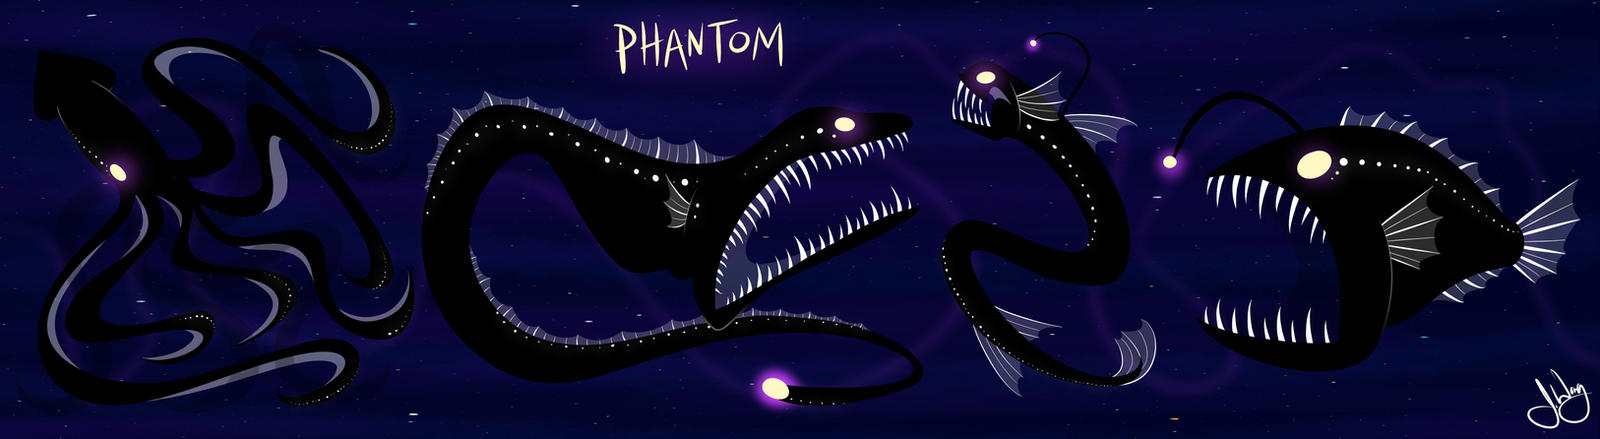 Phantom by imajenink